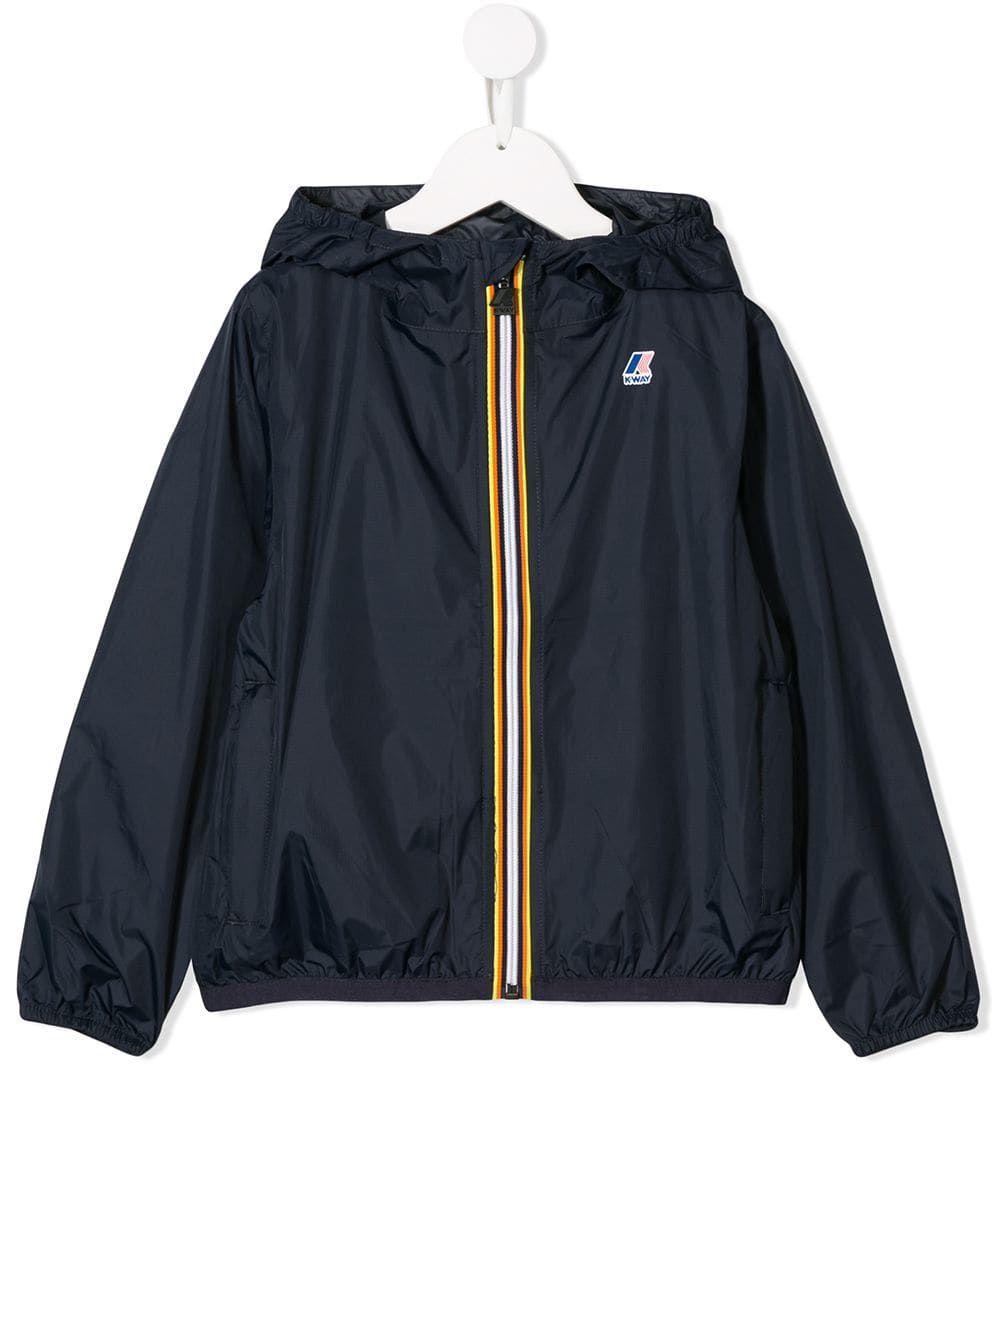 K Way Kids Hooded Jacket | Hooded jacket, Jackets, Green jacket